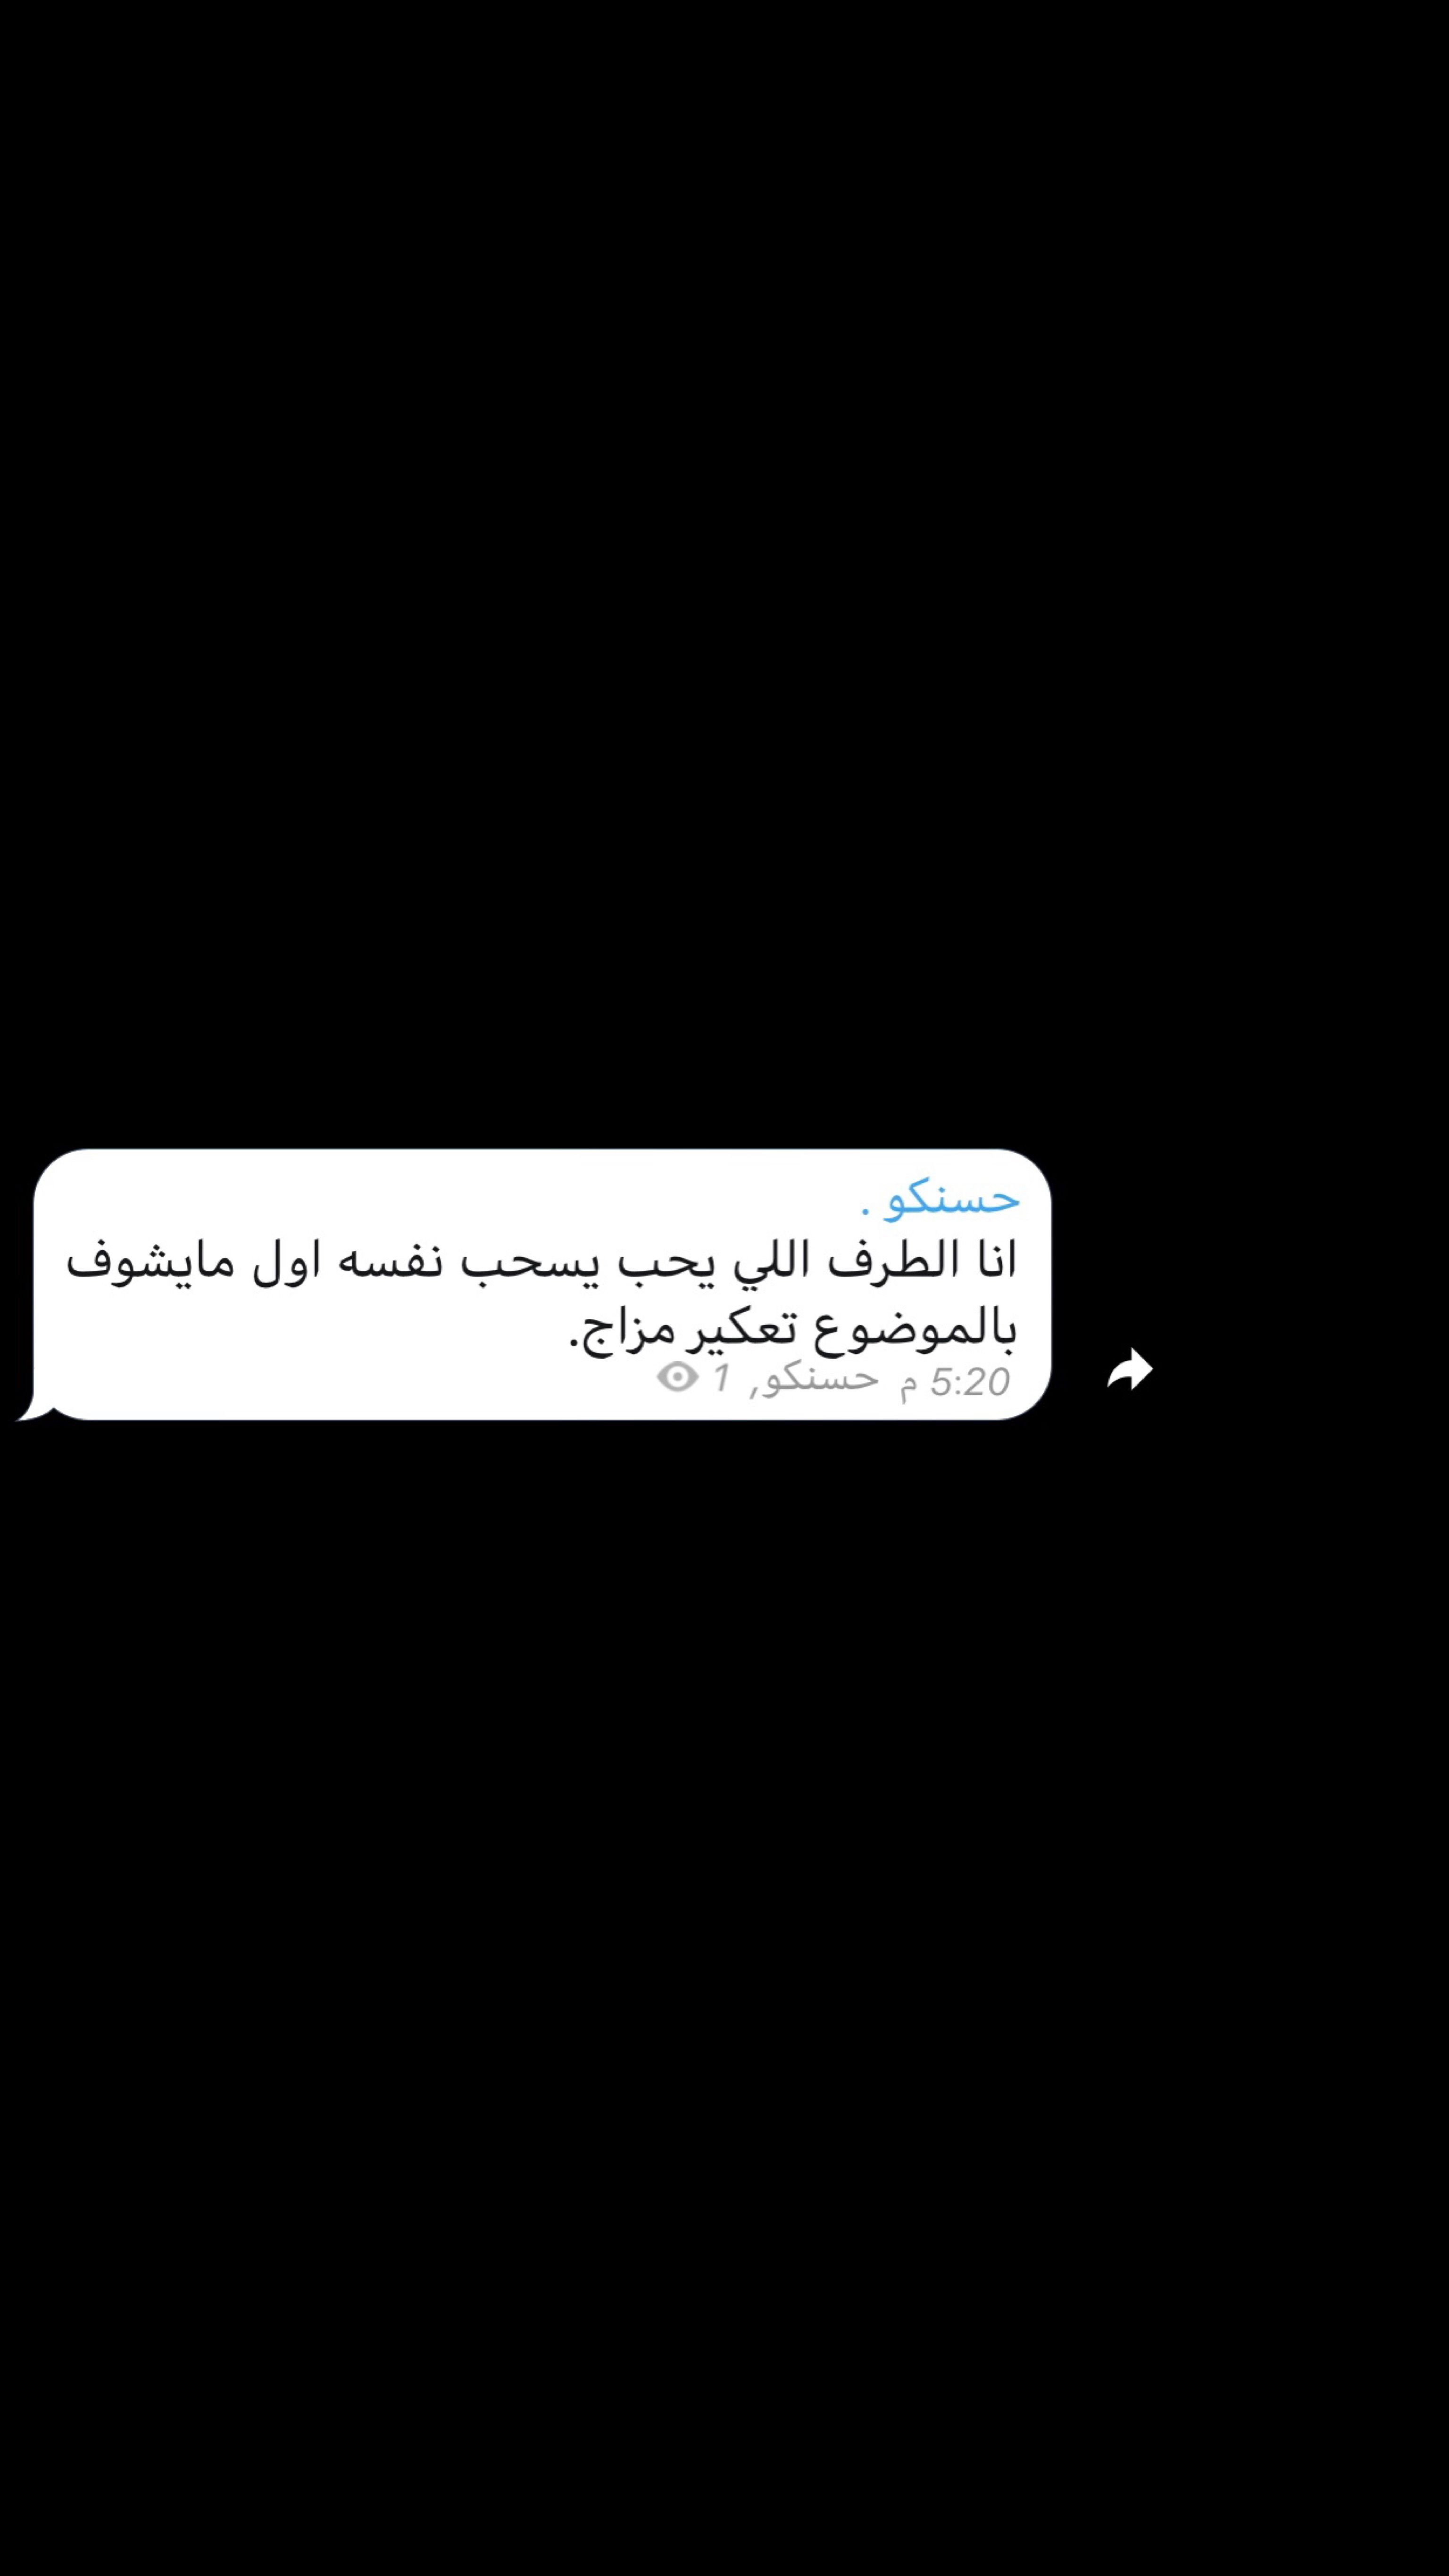 Pin By ʙᴀǫᴇʀ On صور مكتوب عليها Quotes Deep Words Arabic Words